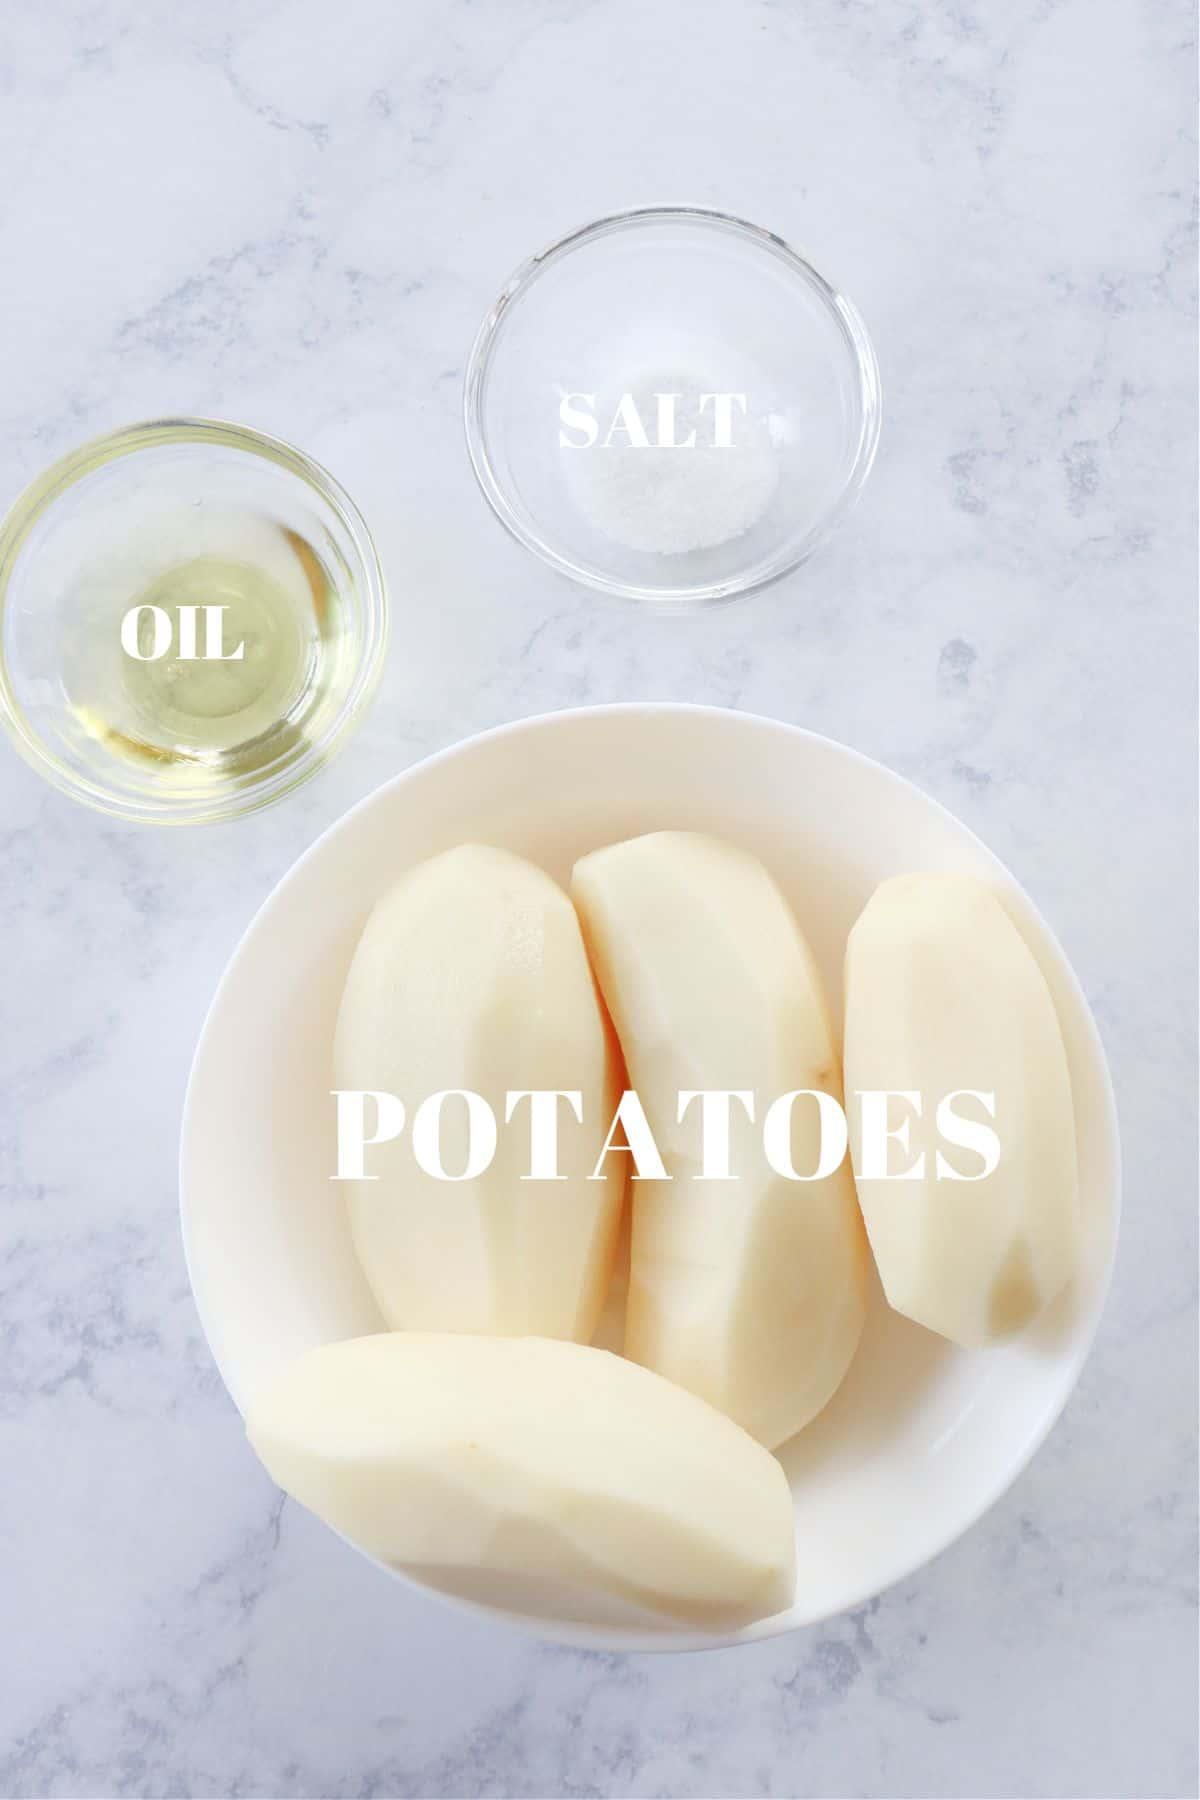 air fryer potato chips ingredients 1 Air Fryer Potato Chips